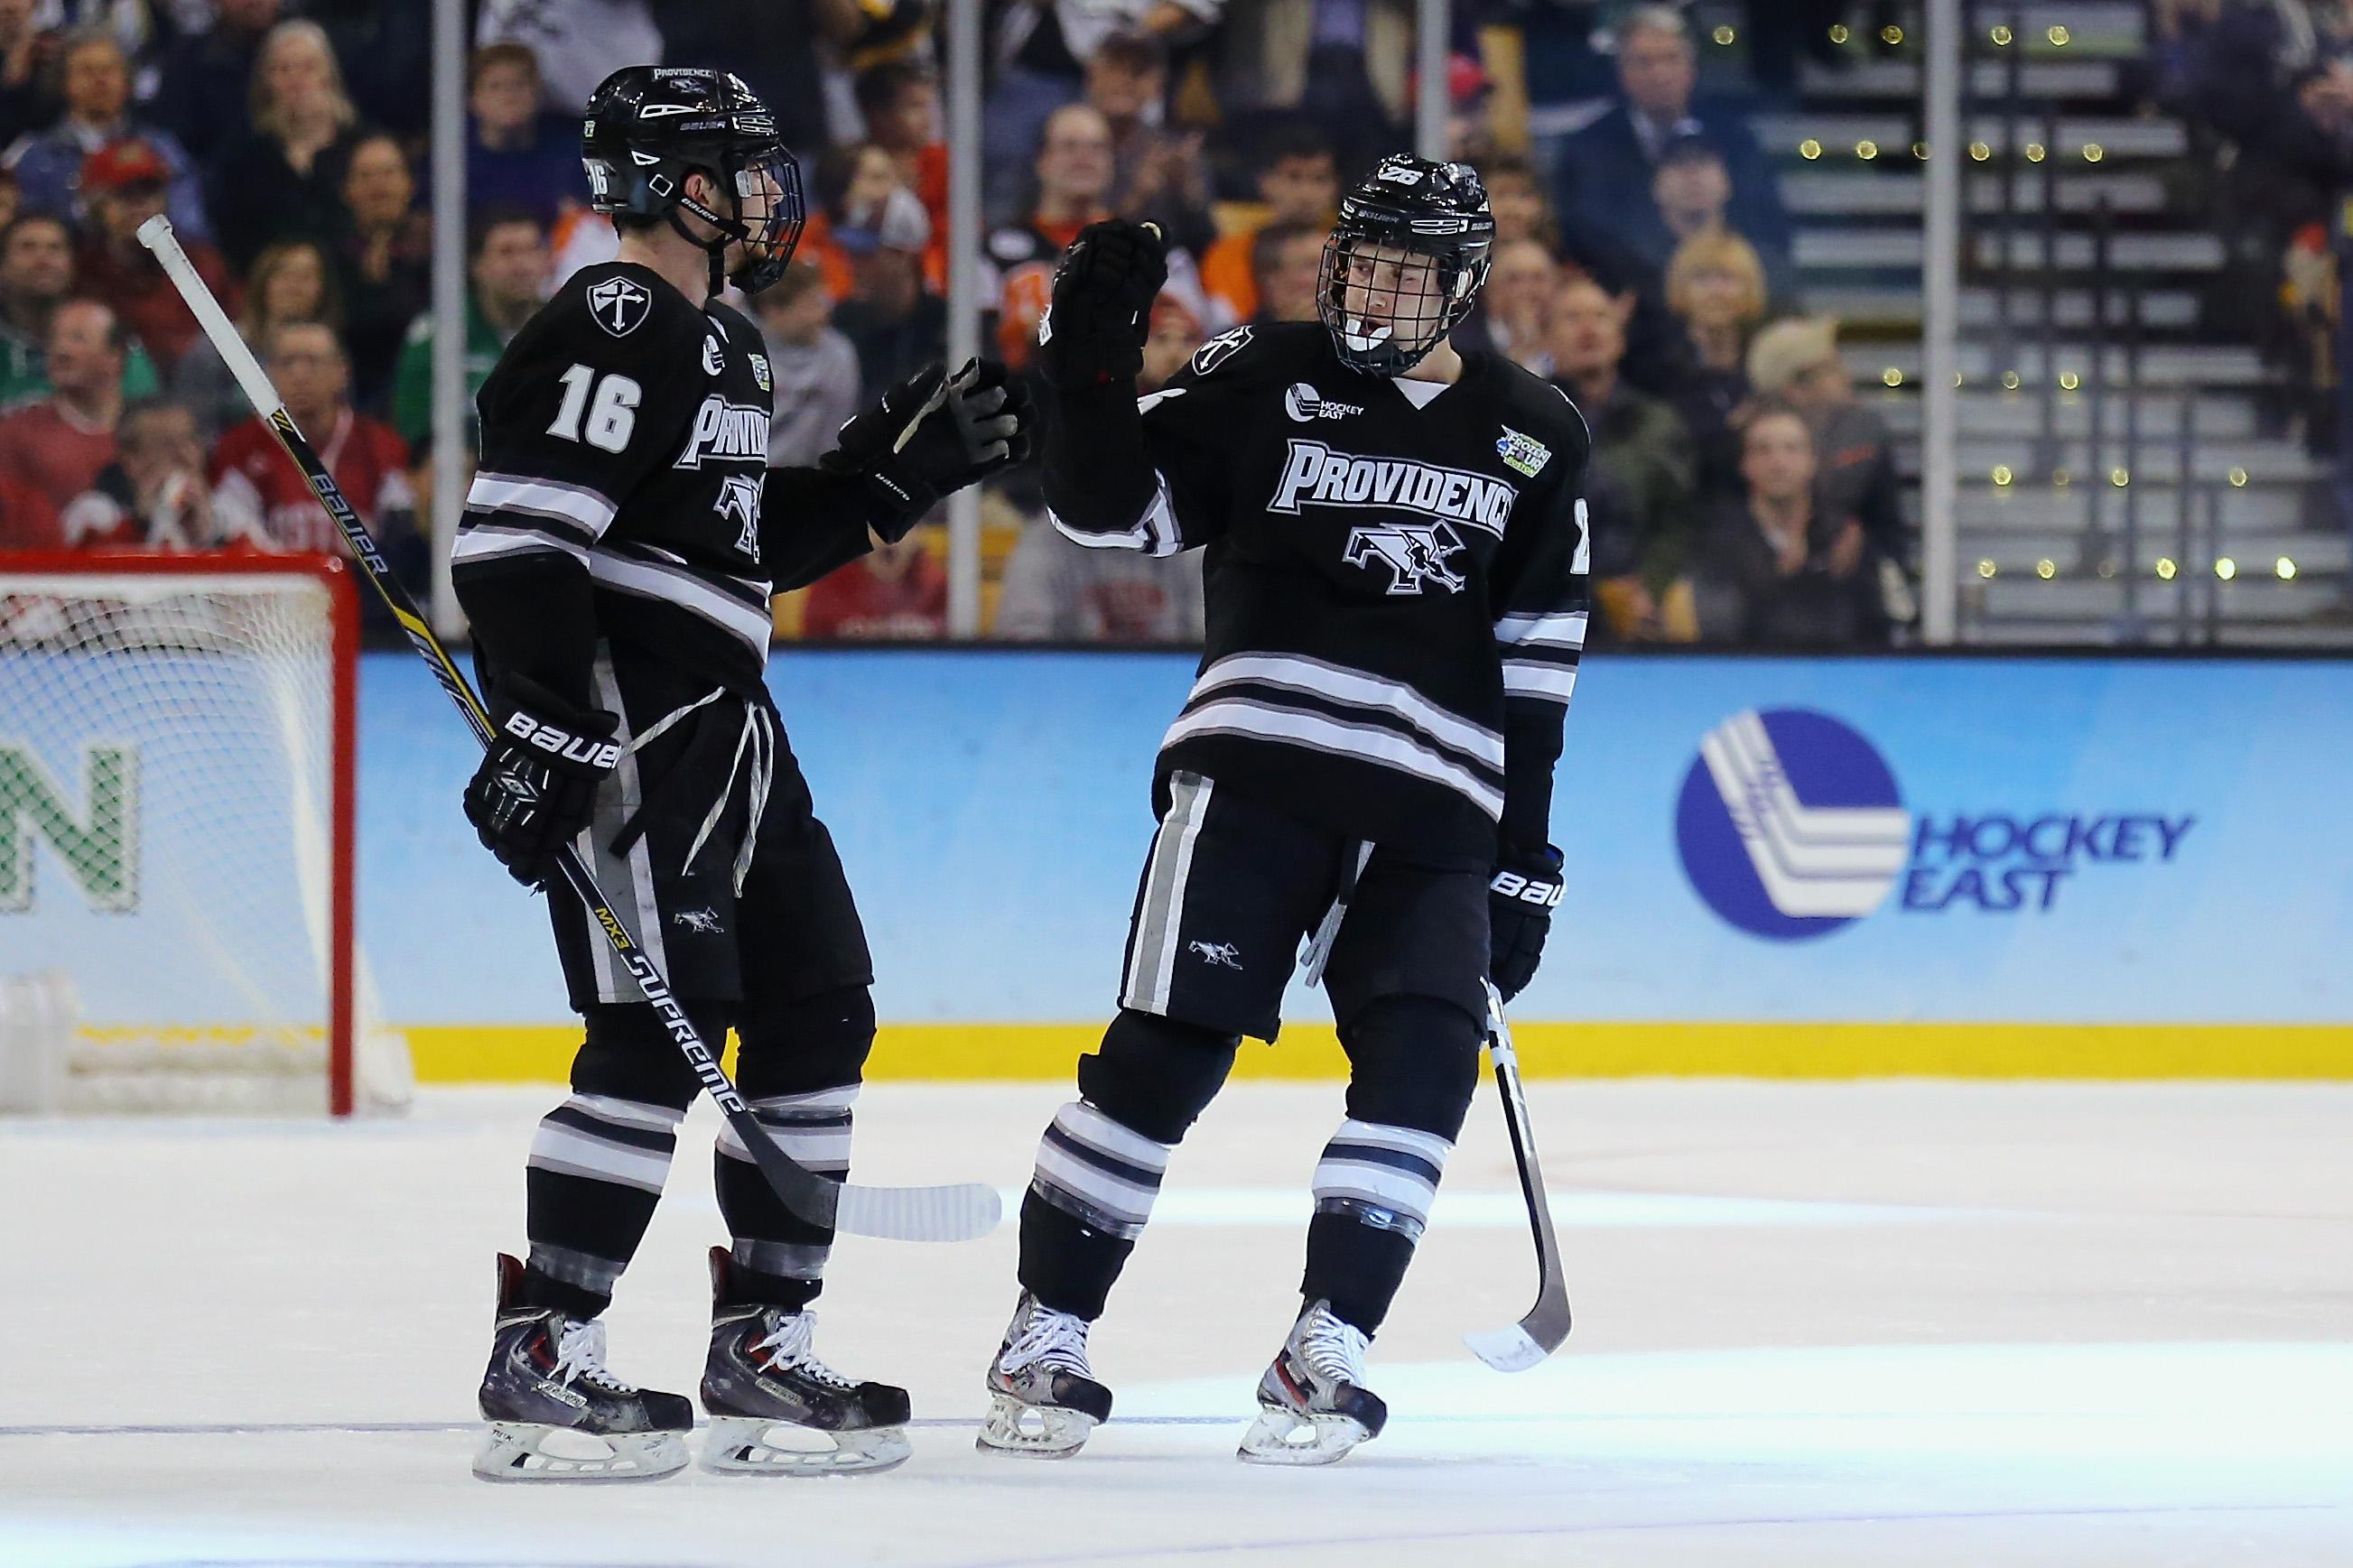 Hockey East: Pinho's Development Keys Second Half Surge For Friars